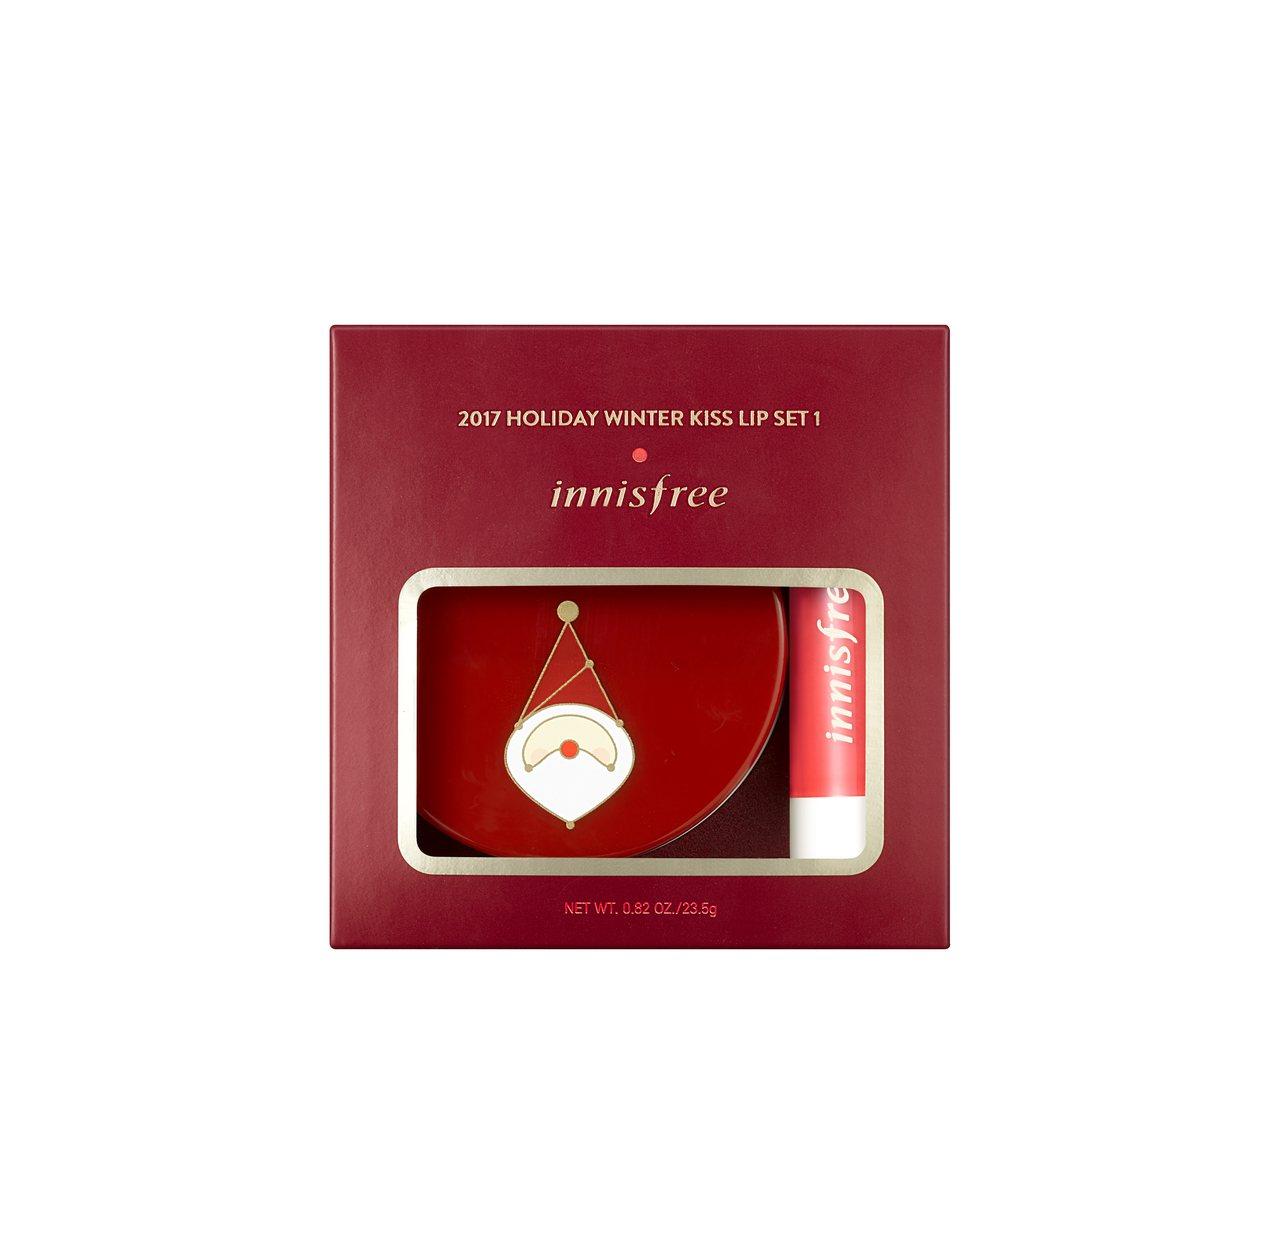 innisfree 2017綠色耶誕暖心之吻限量護唇組,售價600元。圖/inn...